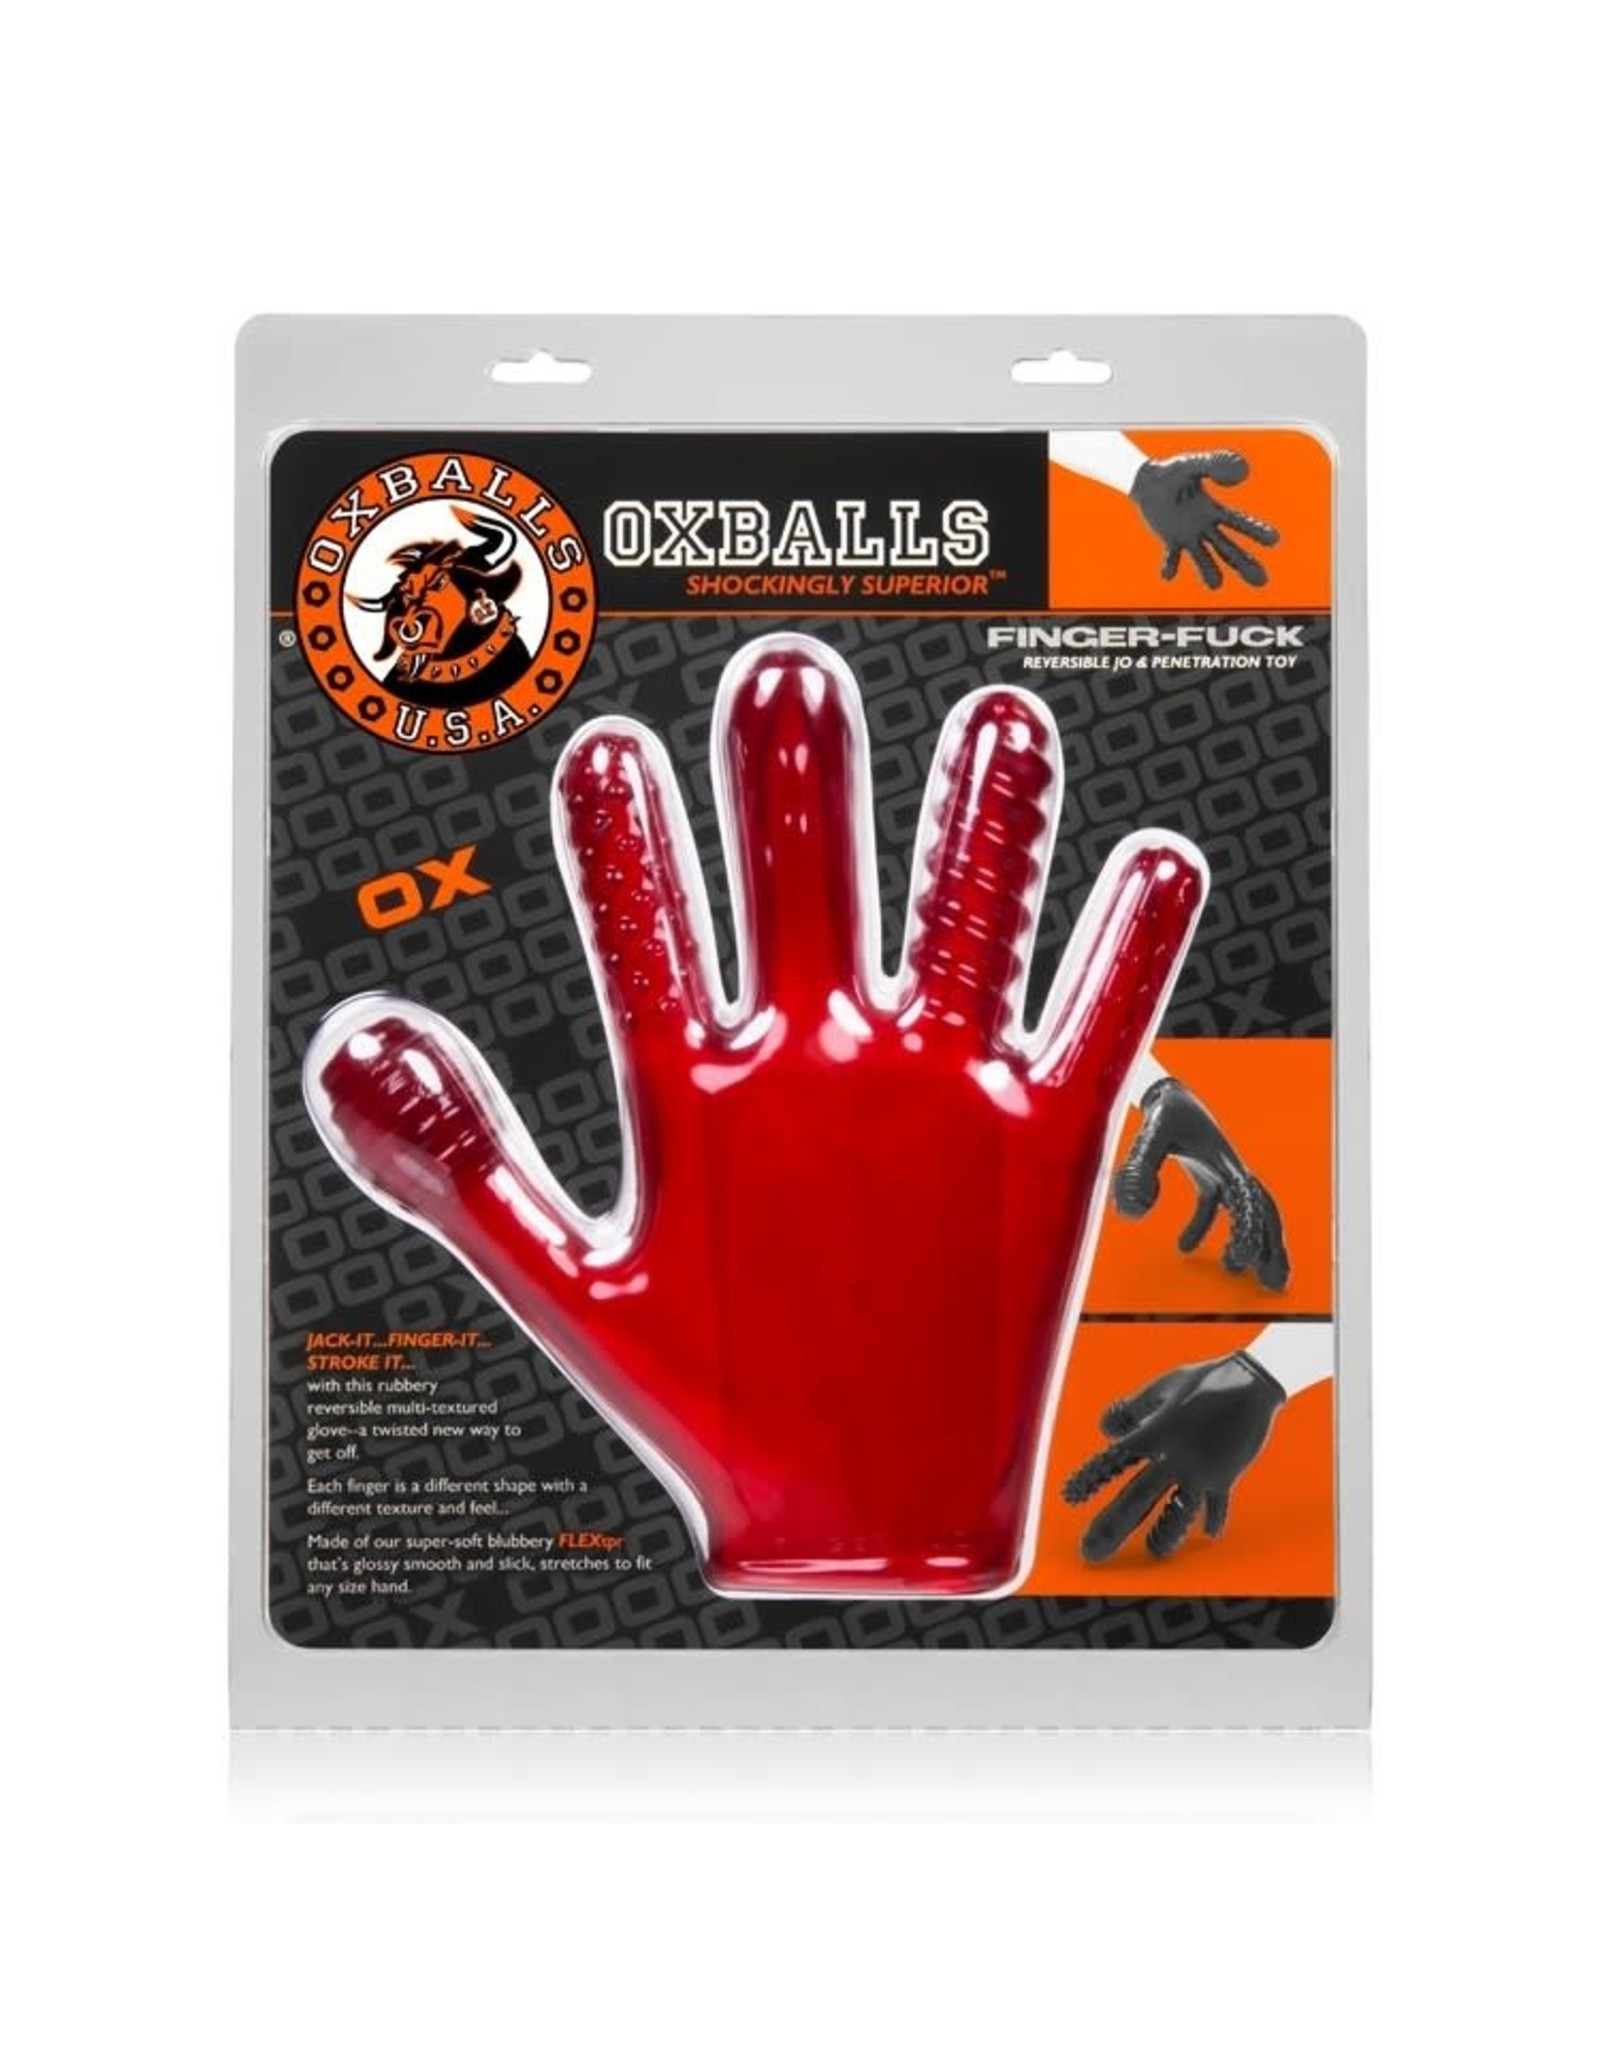 Oxballs OxBalls Finger Fuck Textured Gloves